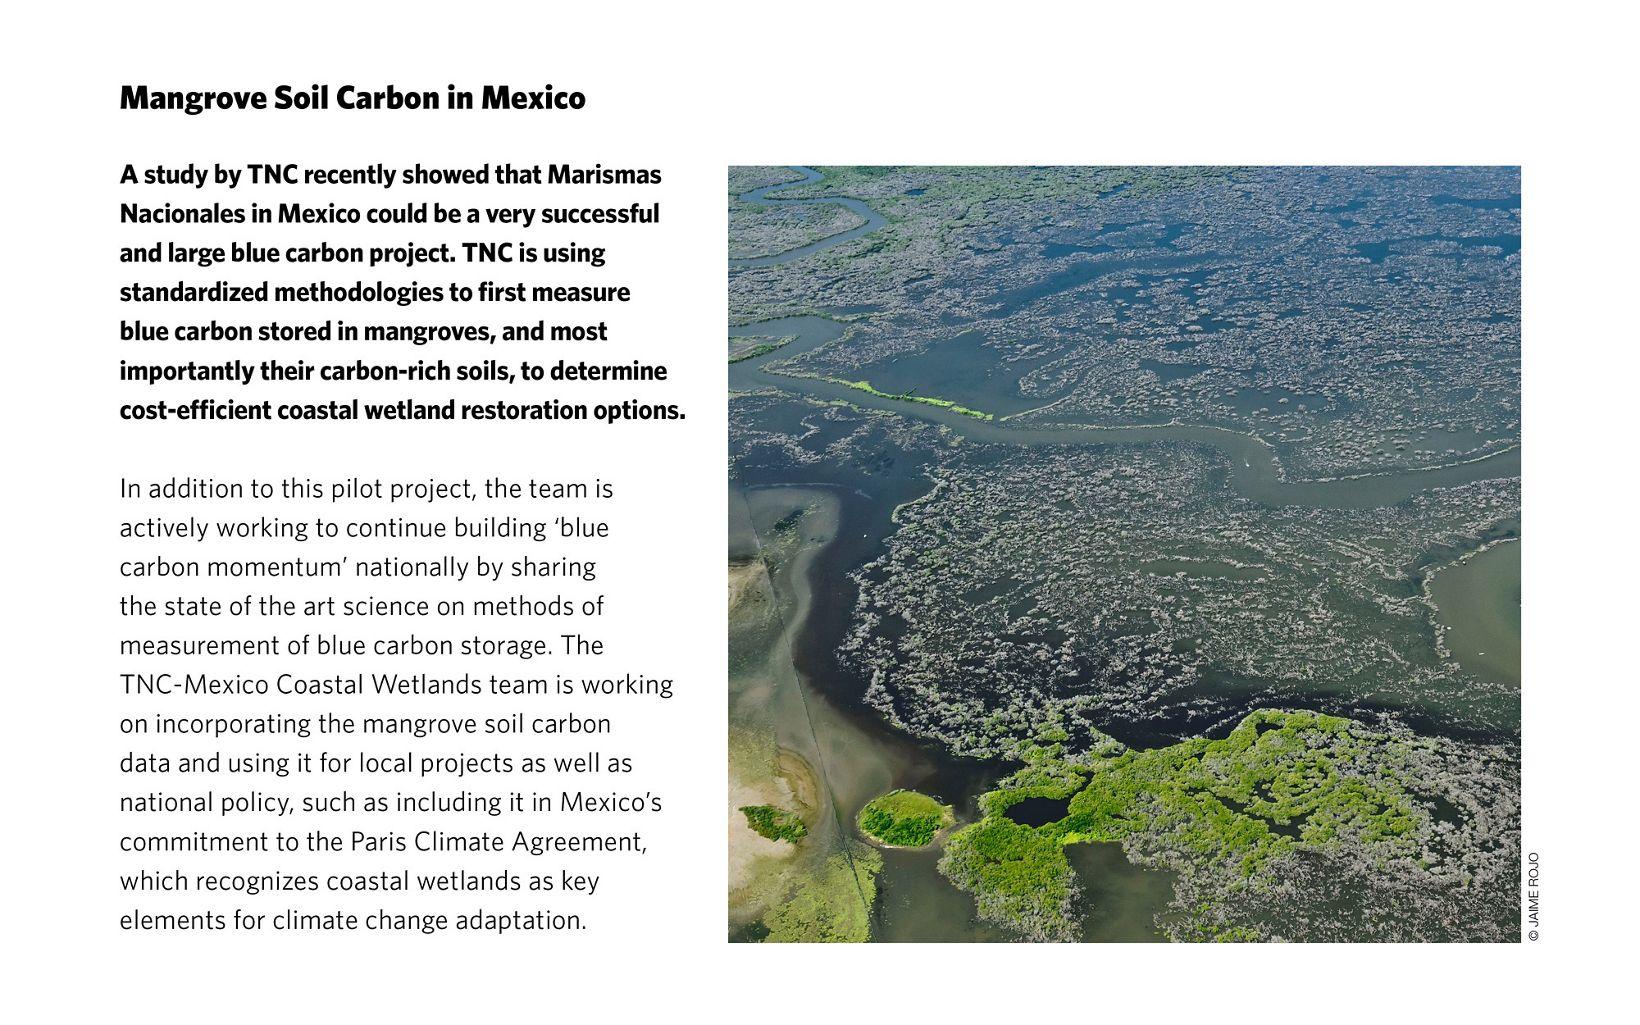 Mangrove Soil Carbon in Mexico